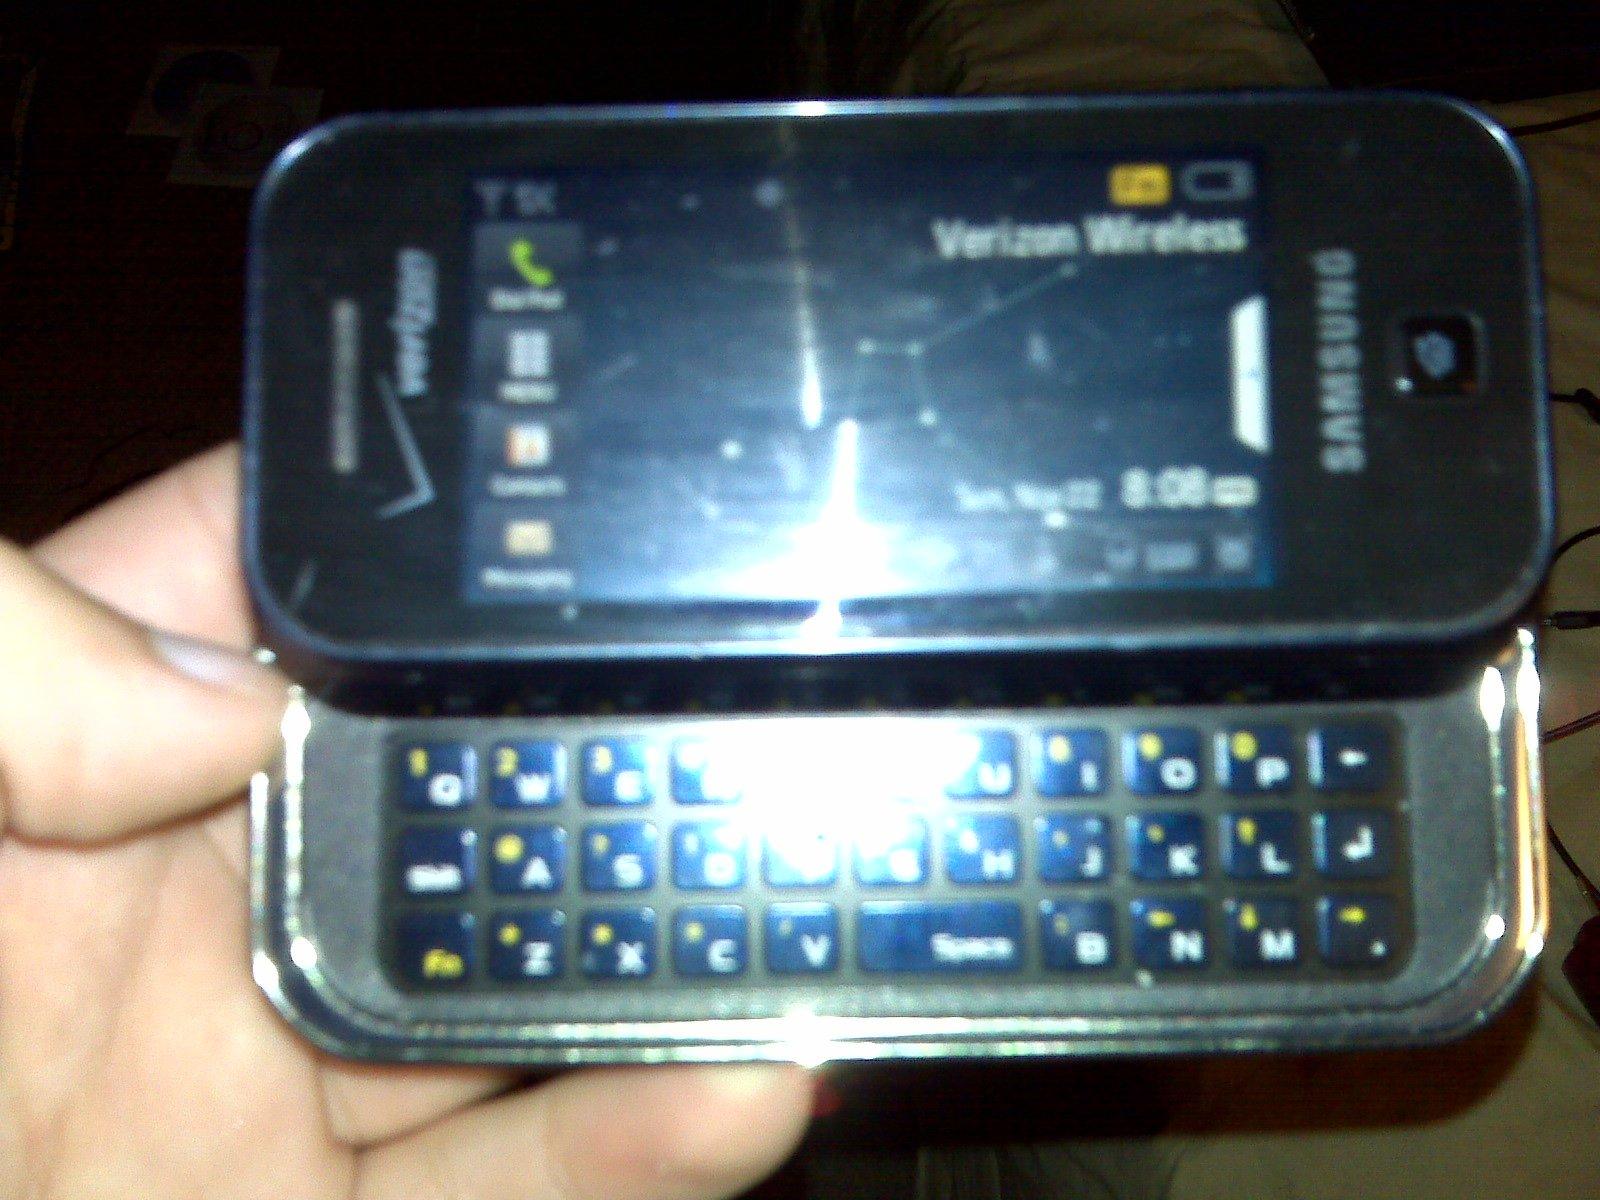 Phone for thread 2